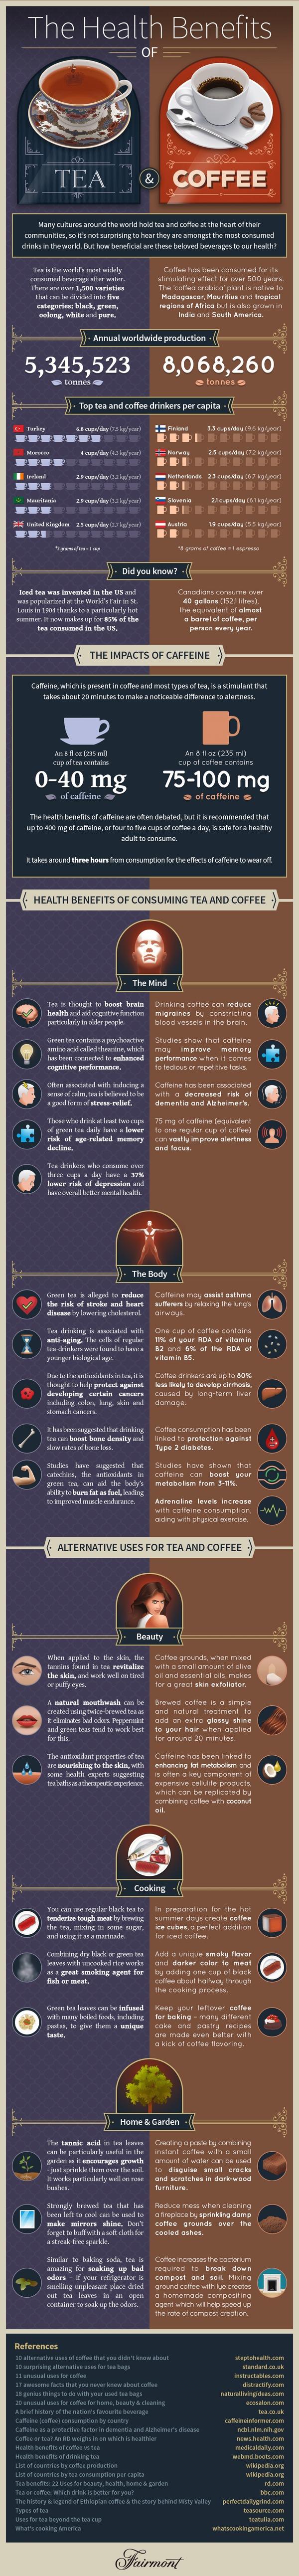 The Health Benefits of Tea and Coffee